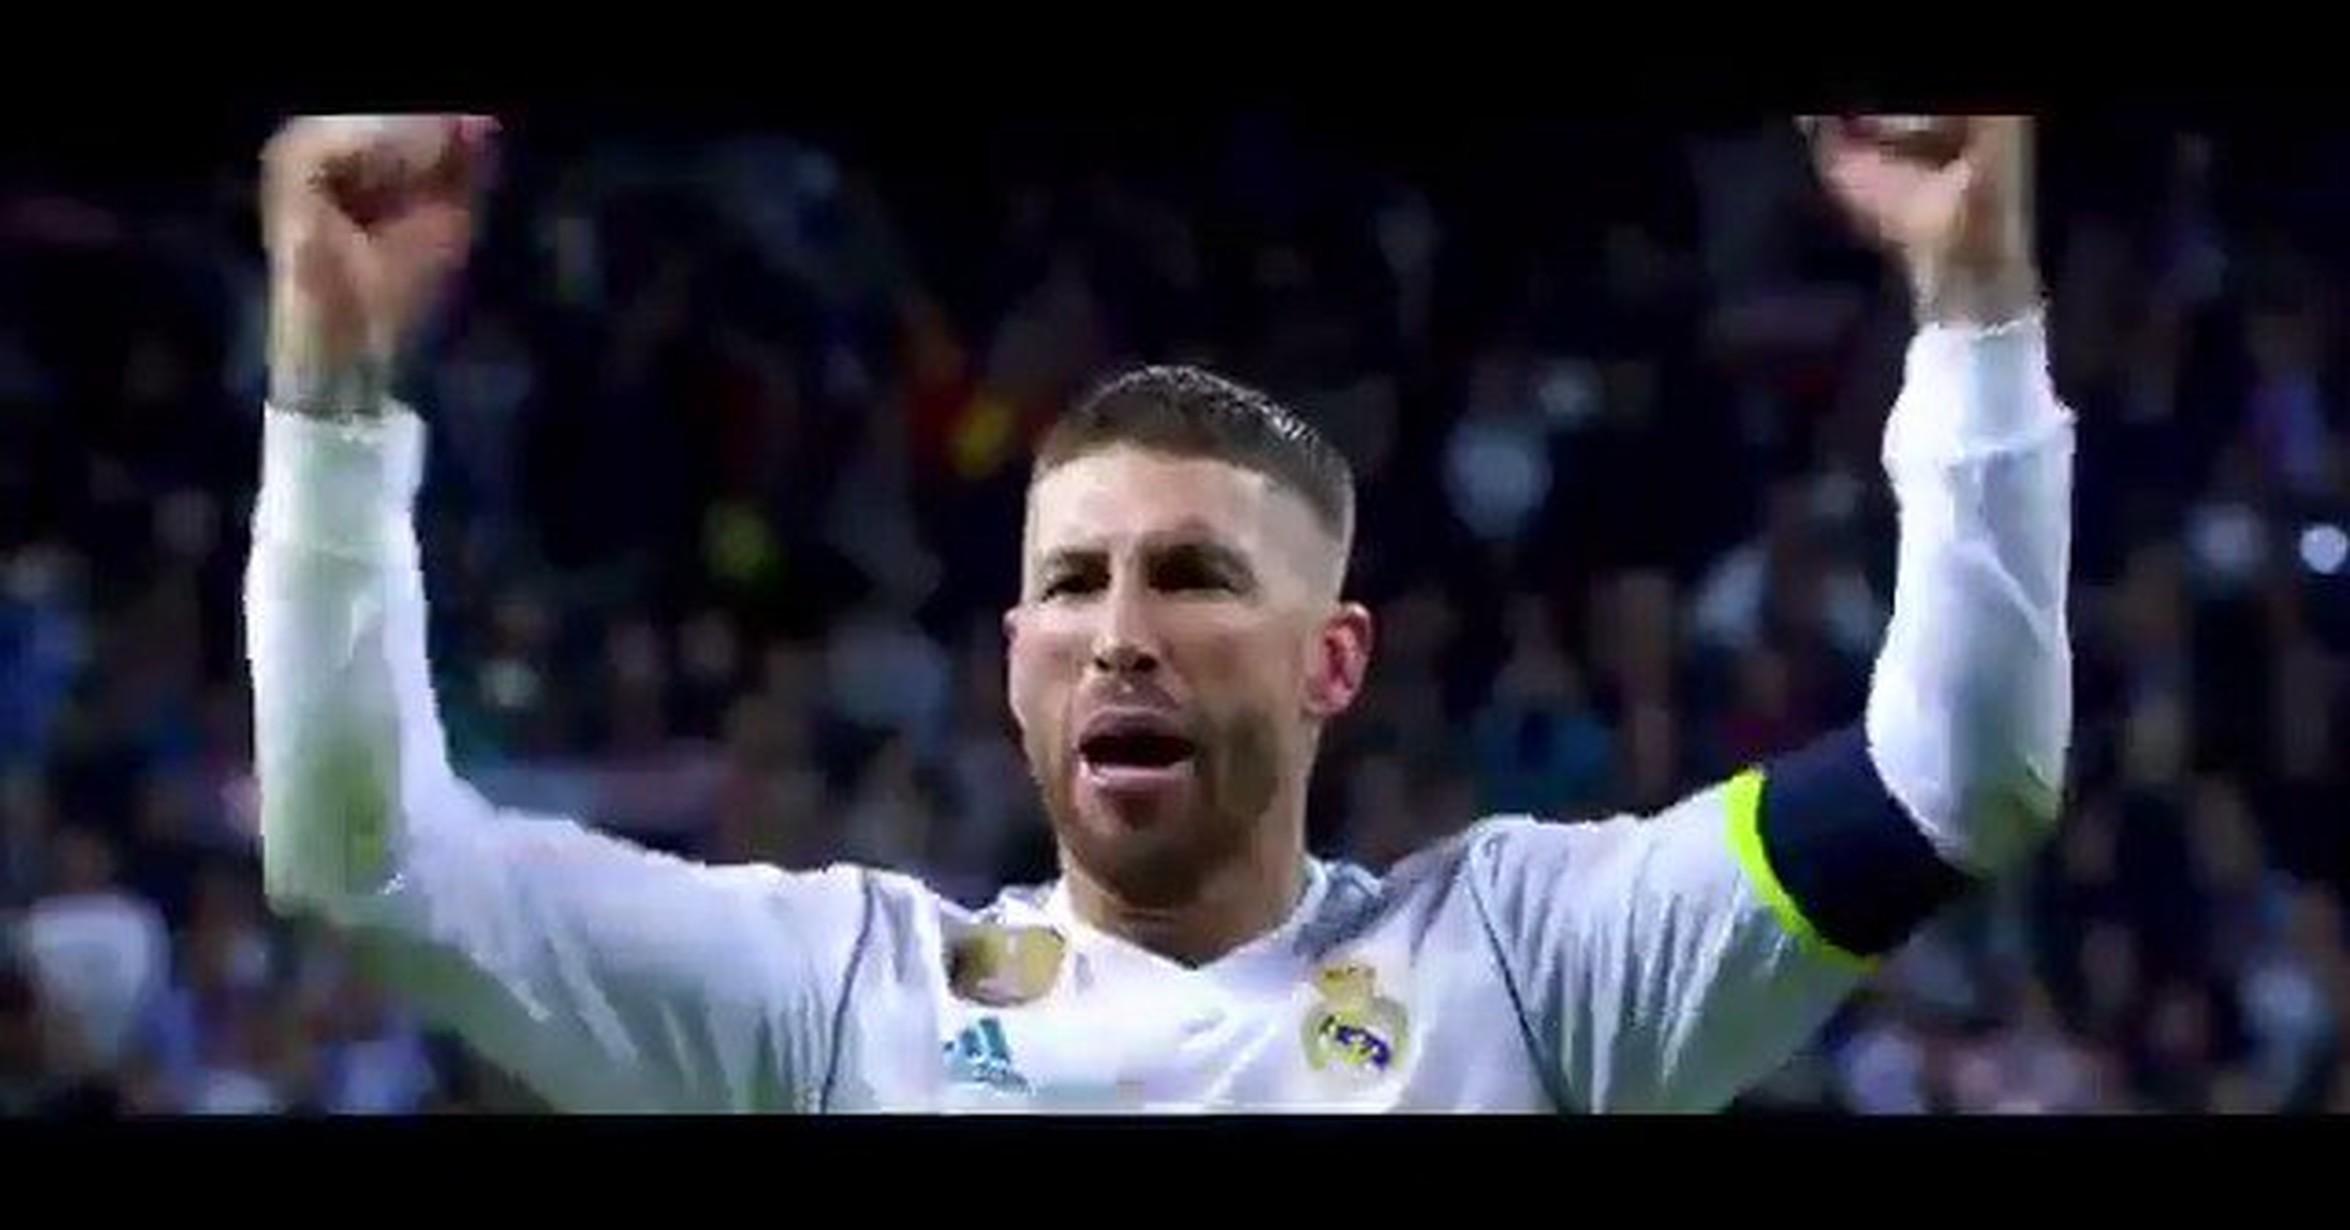 Memedeportes El Video Motivacional Previo A La Champions